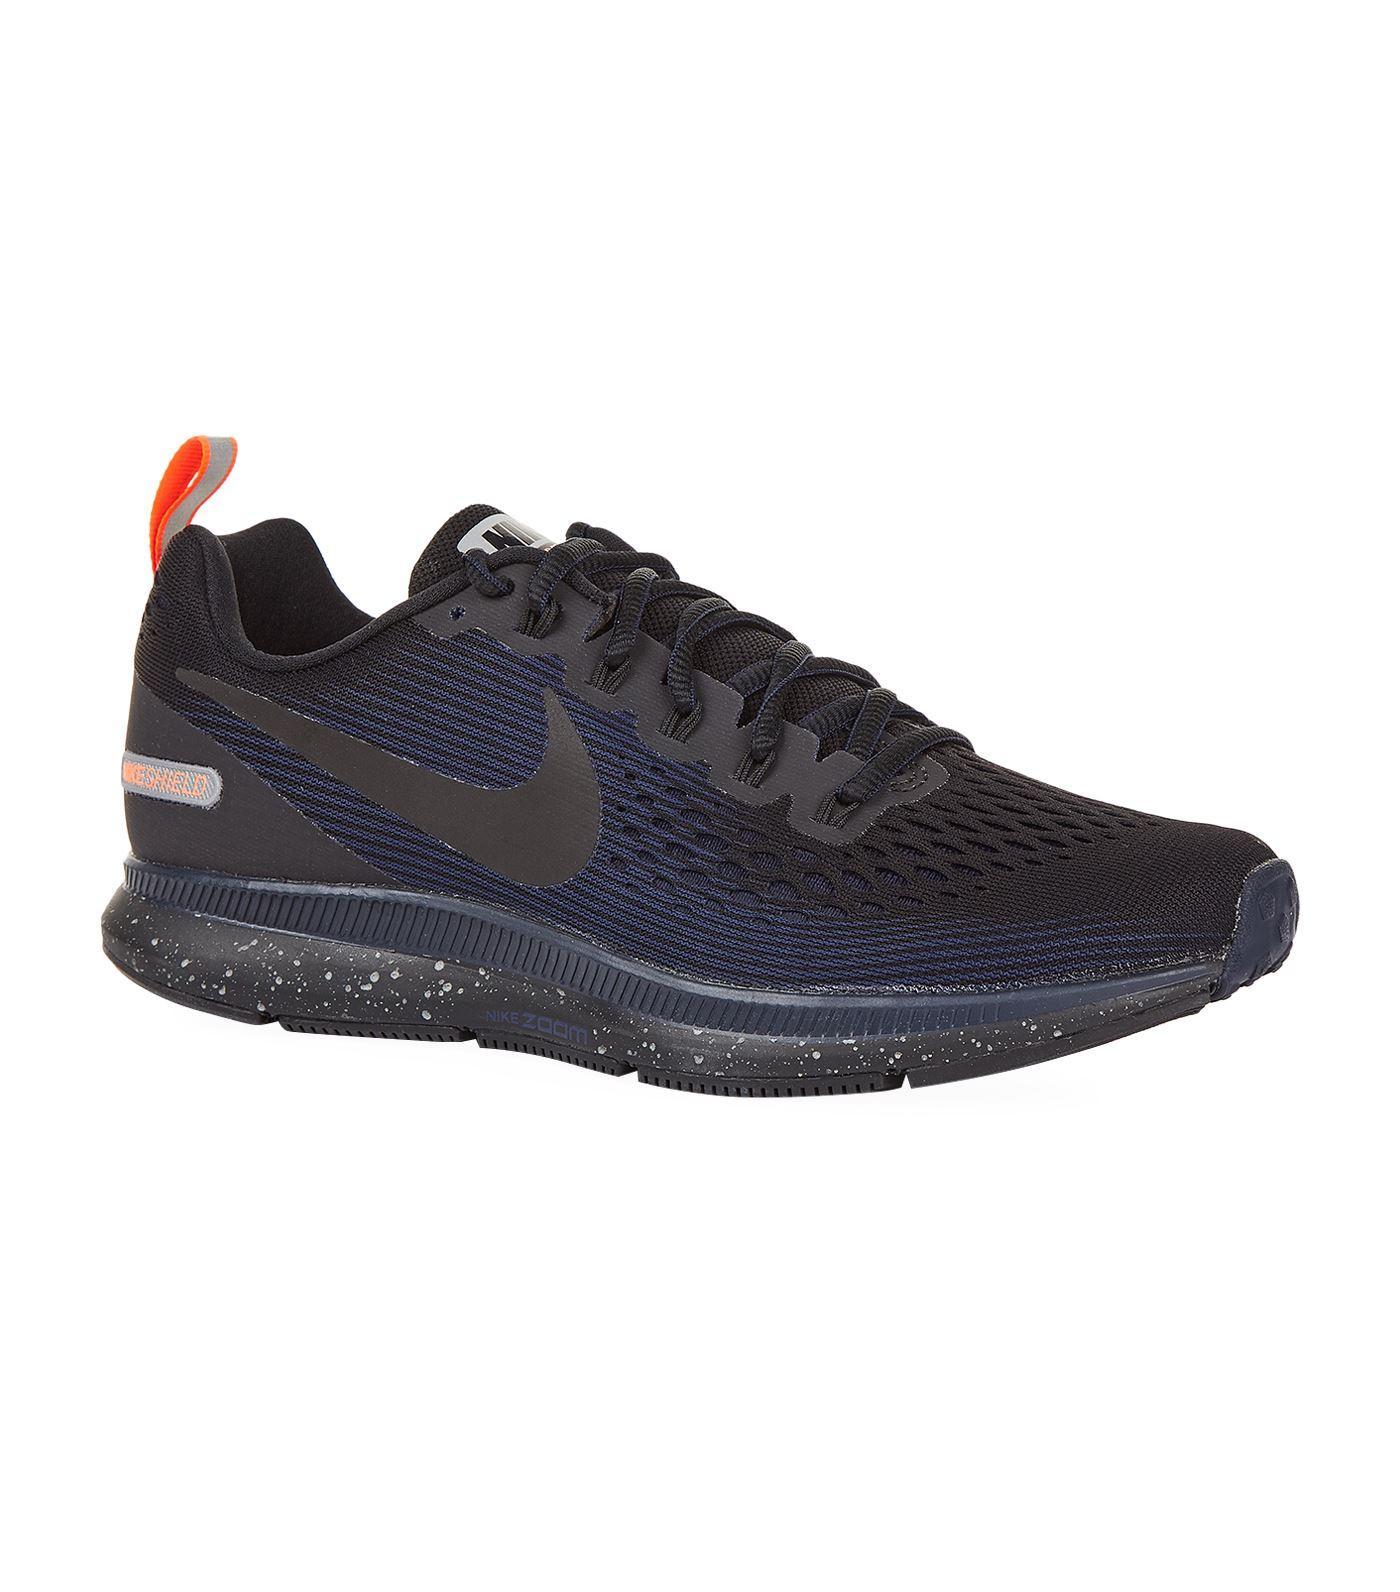 ffe3f73a8890 Nike Air Zoom Pegasus 34 Shield Running Shoe In Black  Black  Obsidian